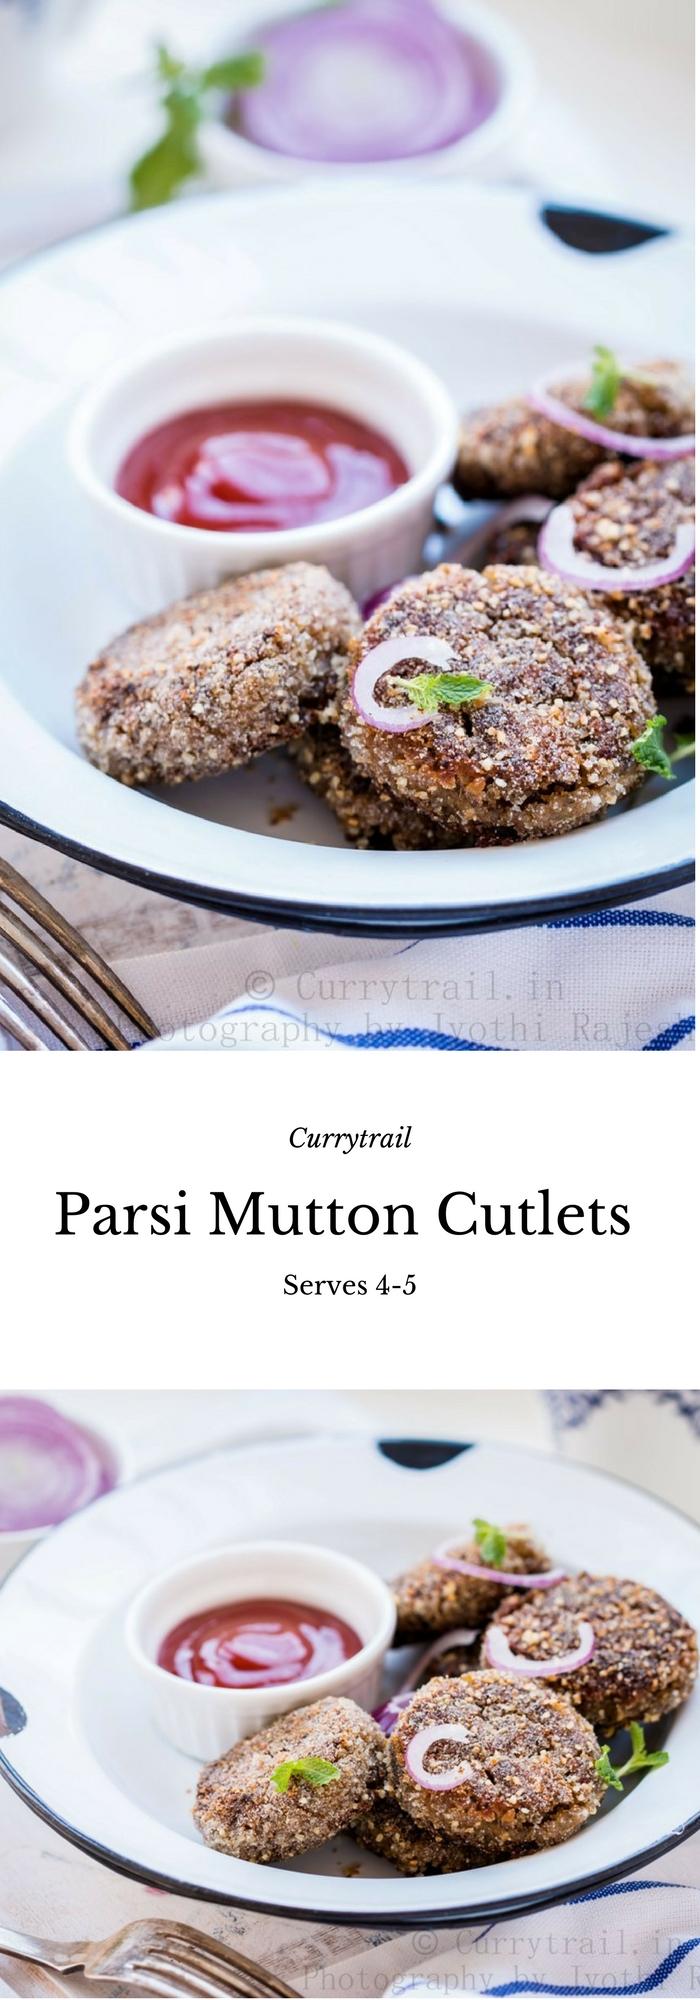 Parsi Mutton Cutlets